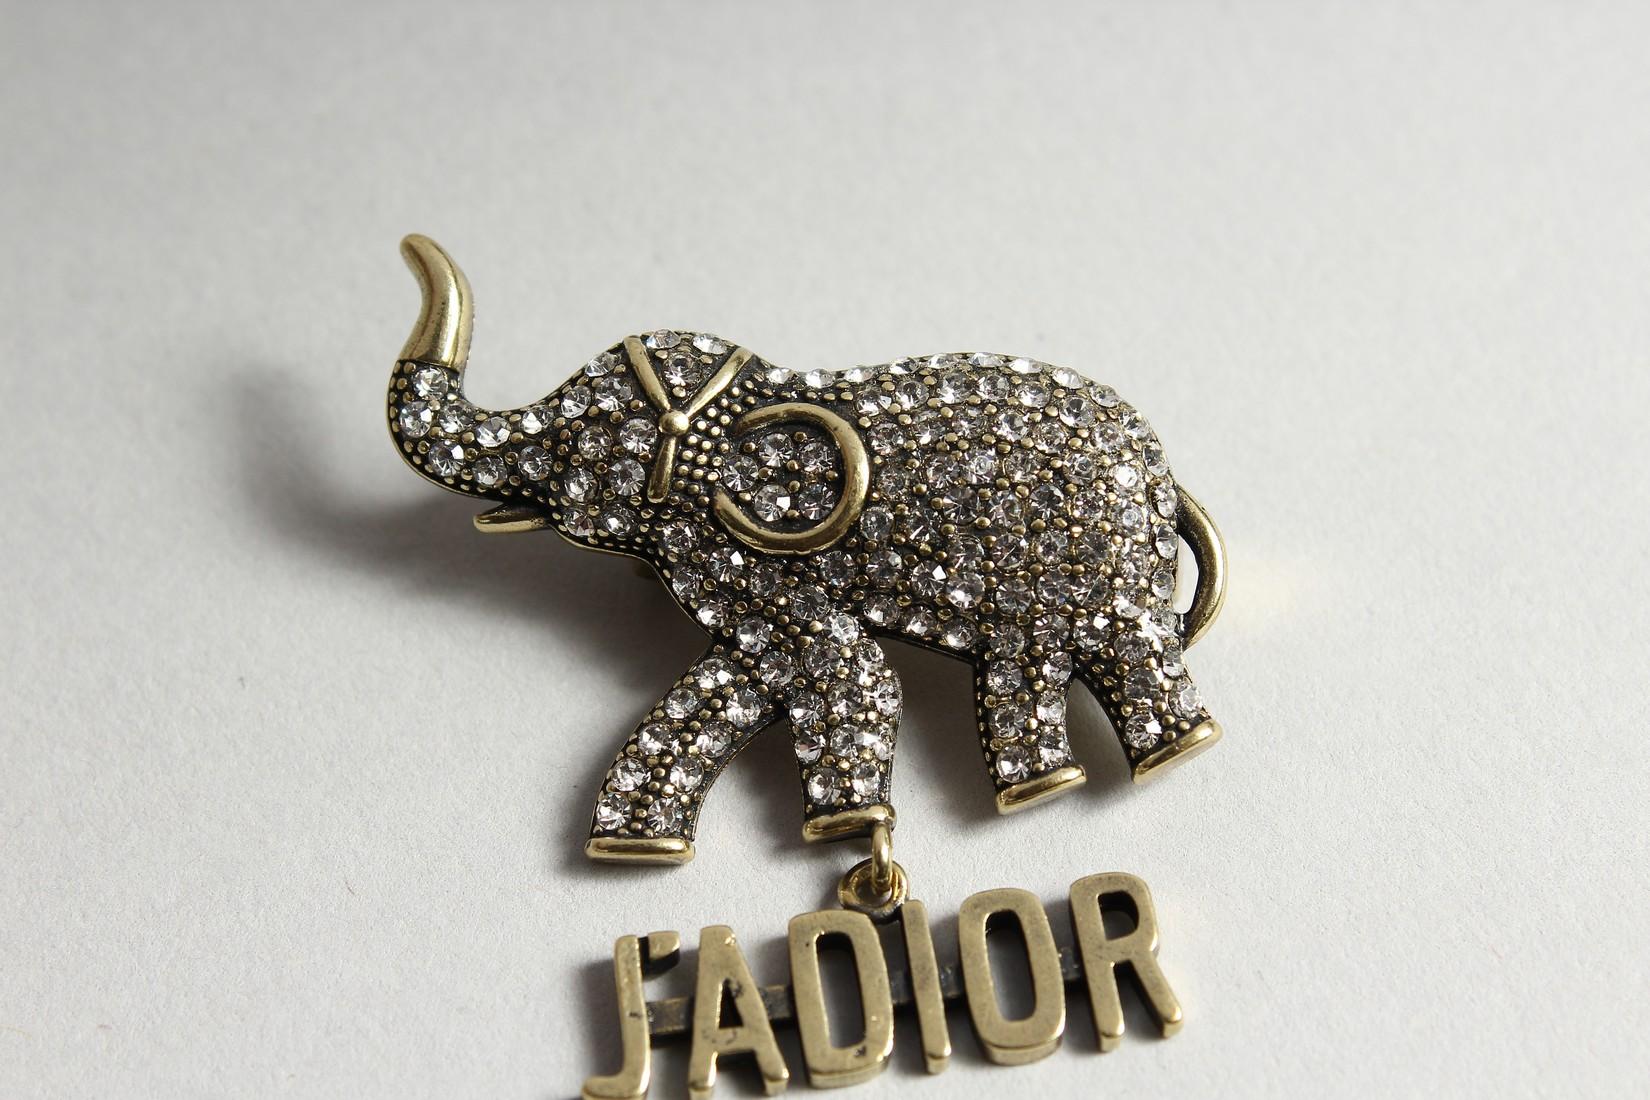 A DIOR JADIOR ELEPHANT BROOCH in a Dior bag and box. - Image 2 of 5